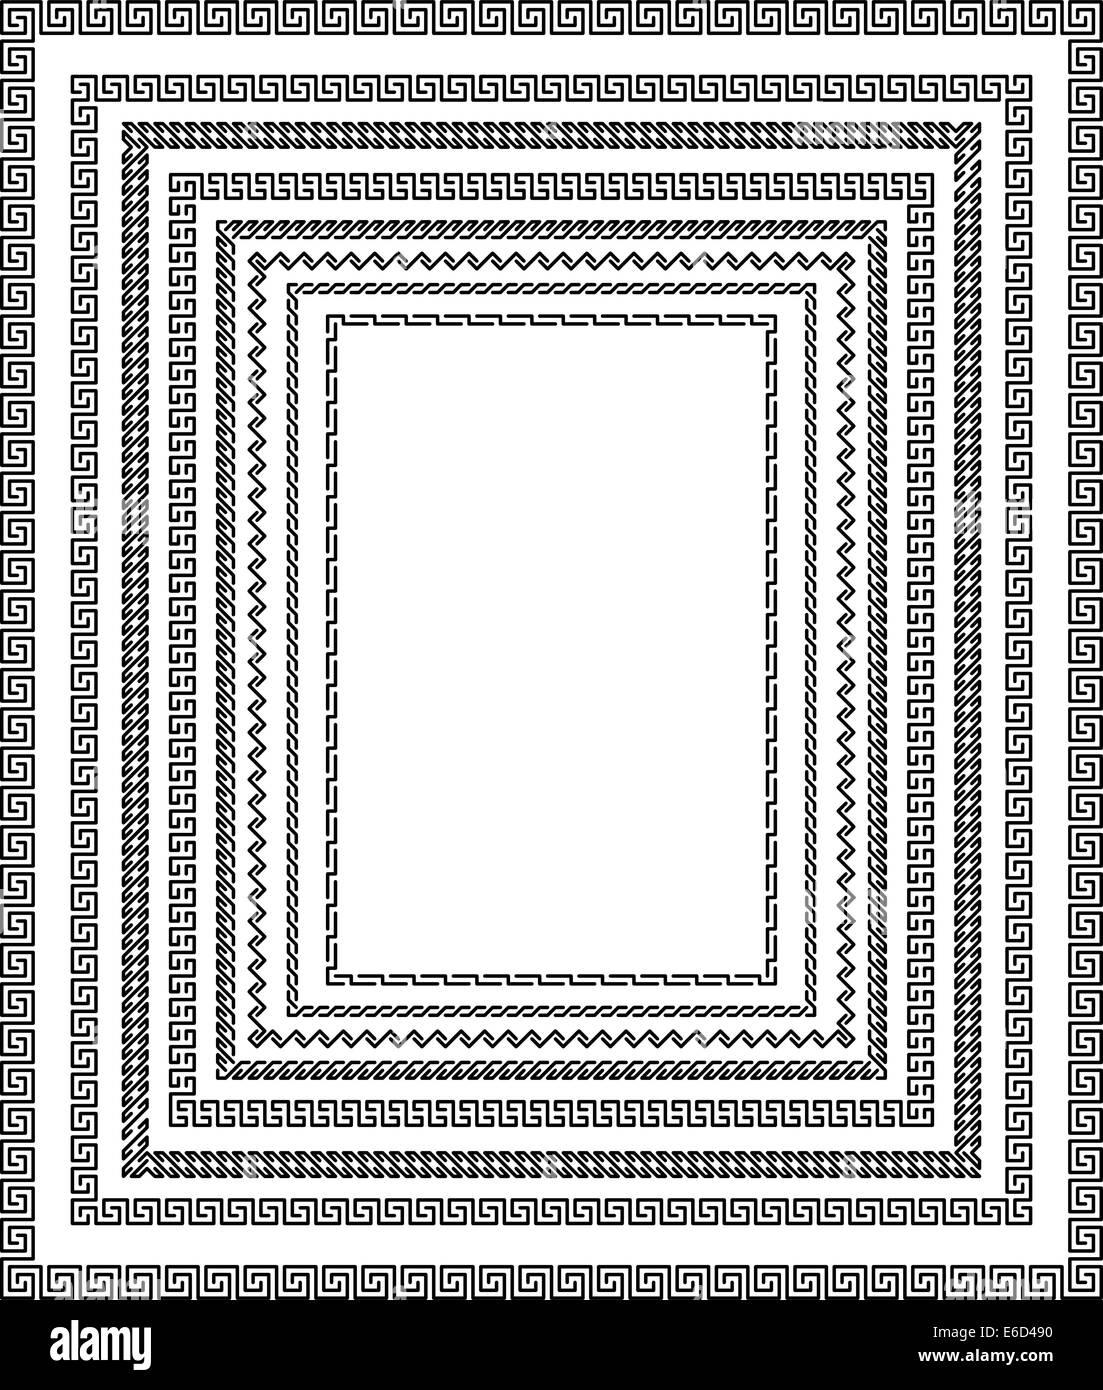 Abstract Frames Stockfotos & Abstract Frames Bilder - Alamy